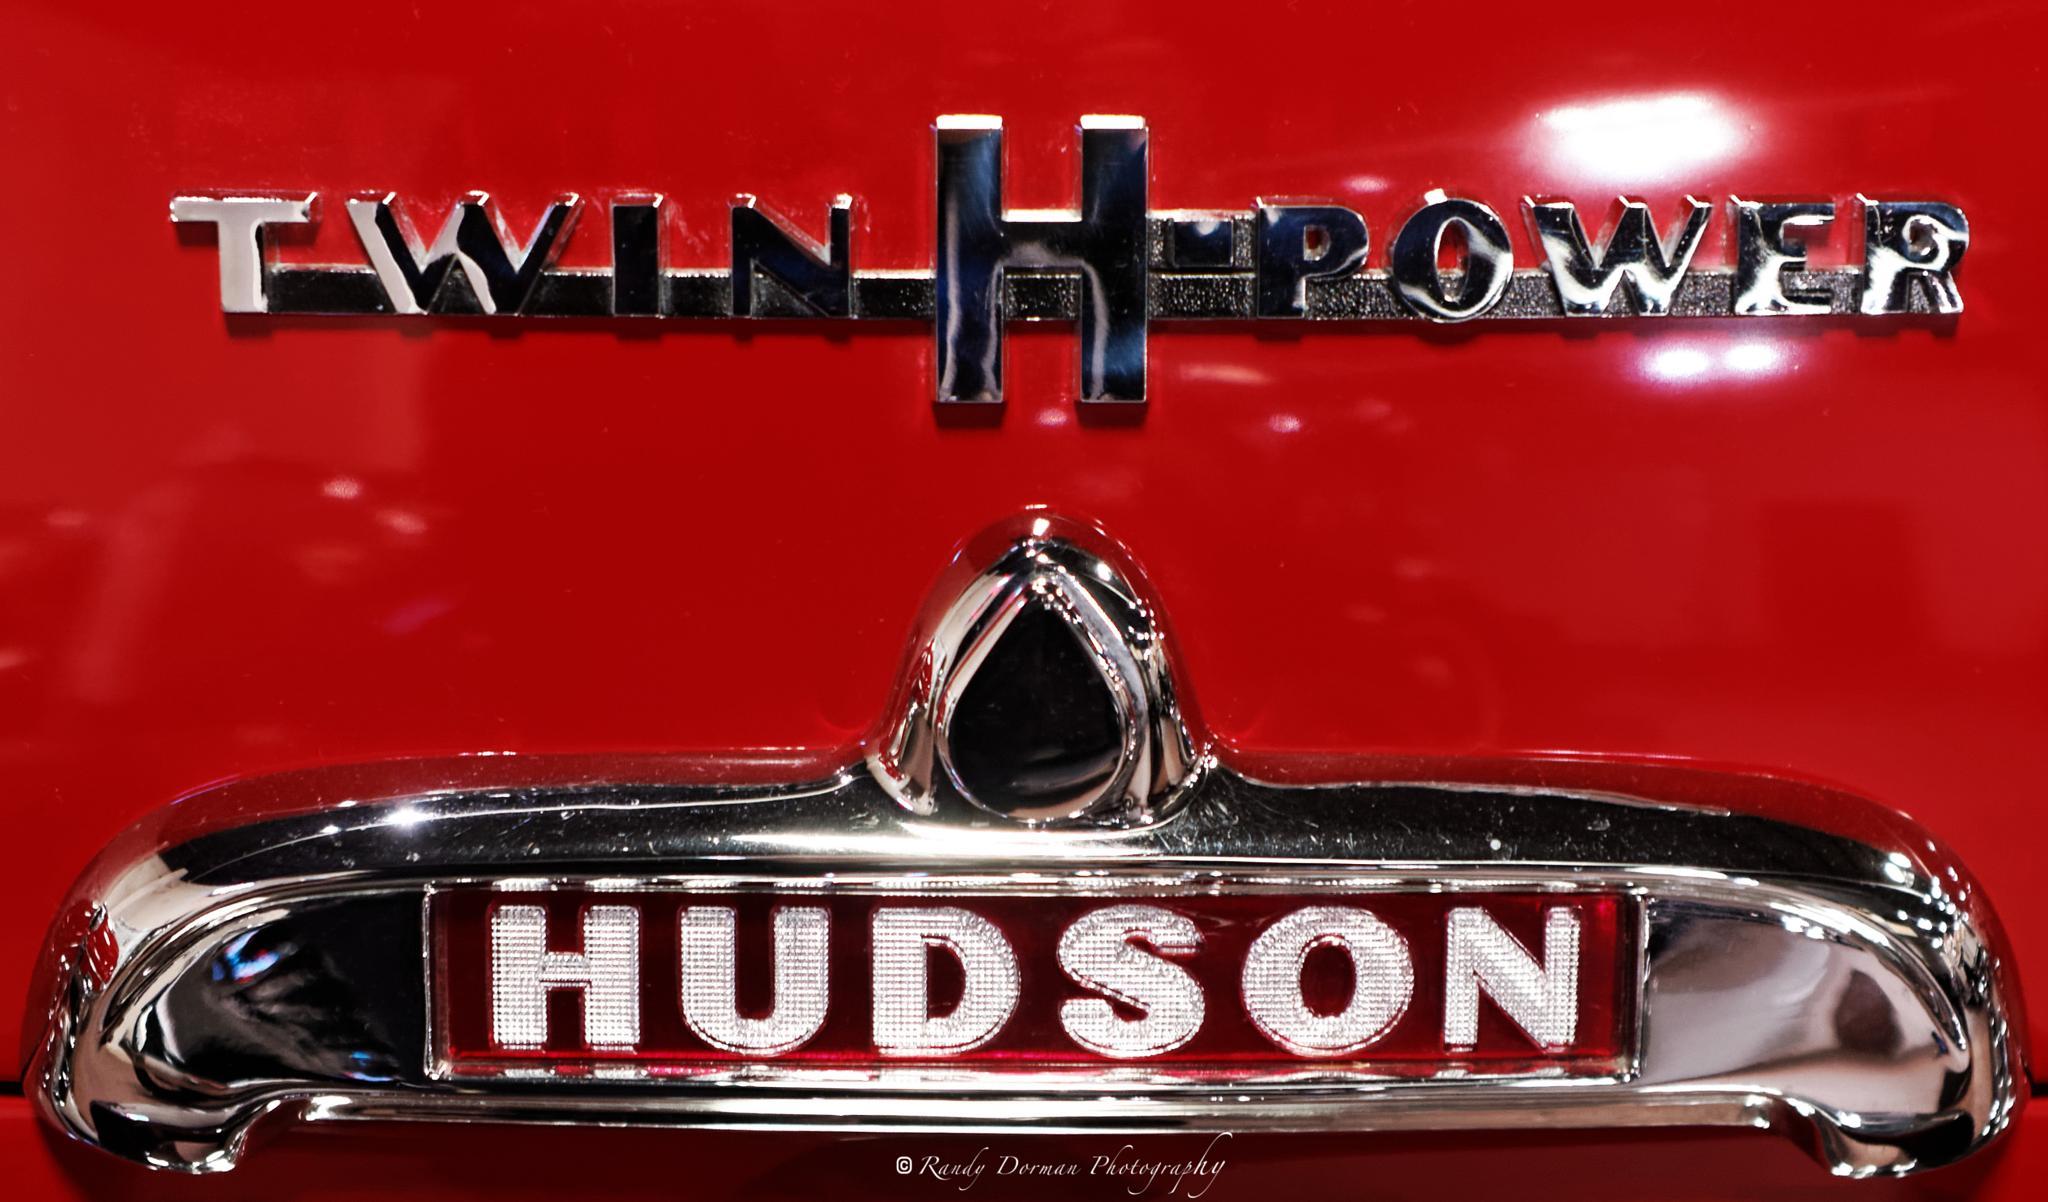 Hudson Museum Shipshewana, IN 42 by Randy Dorman